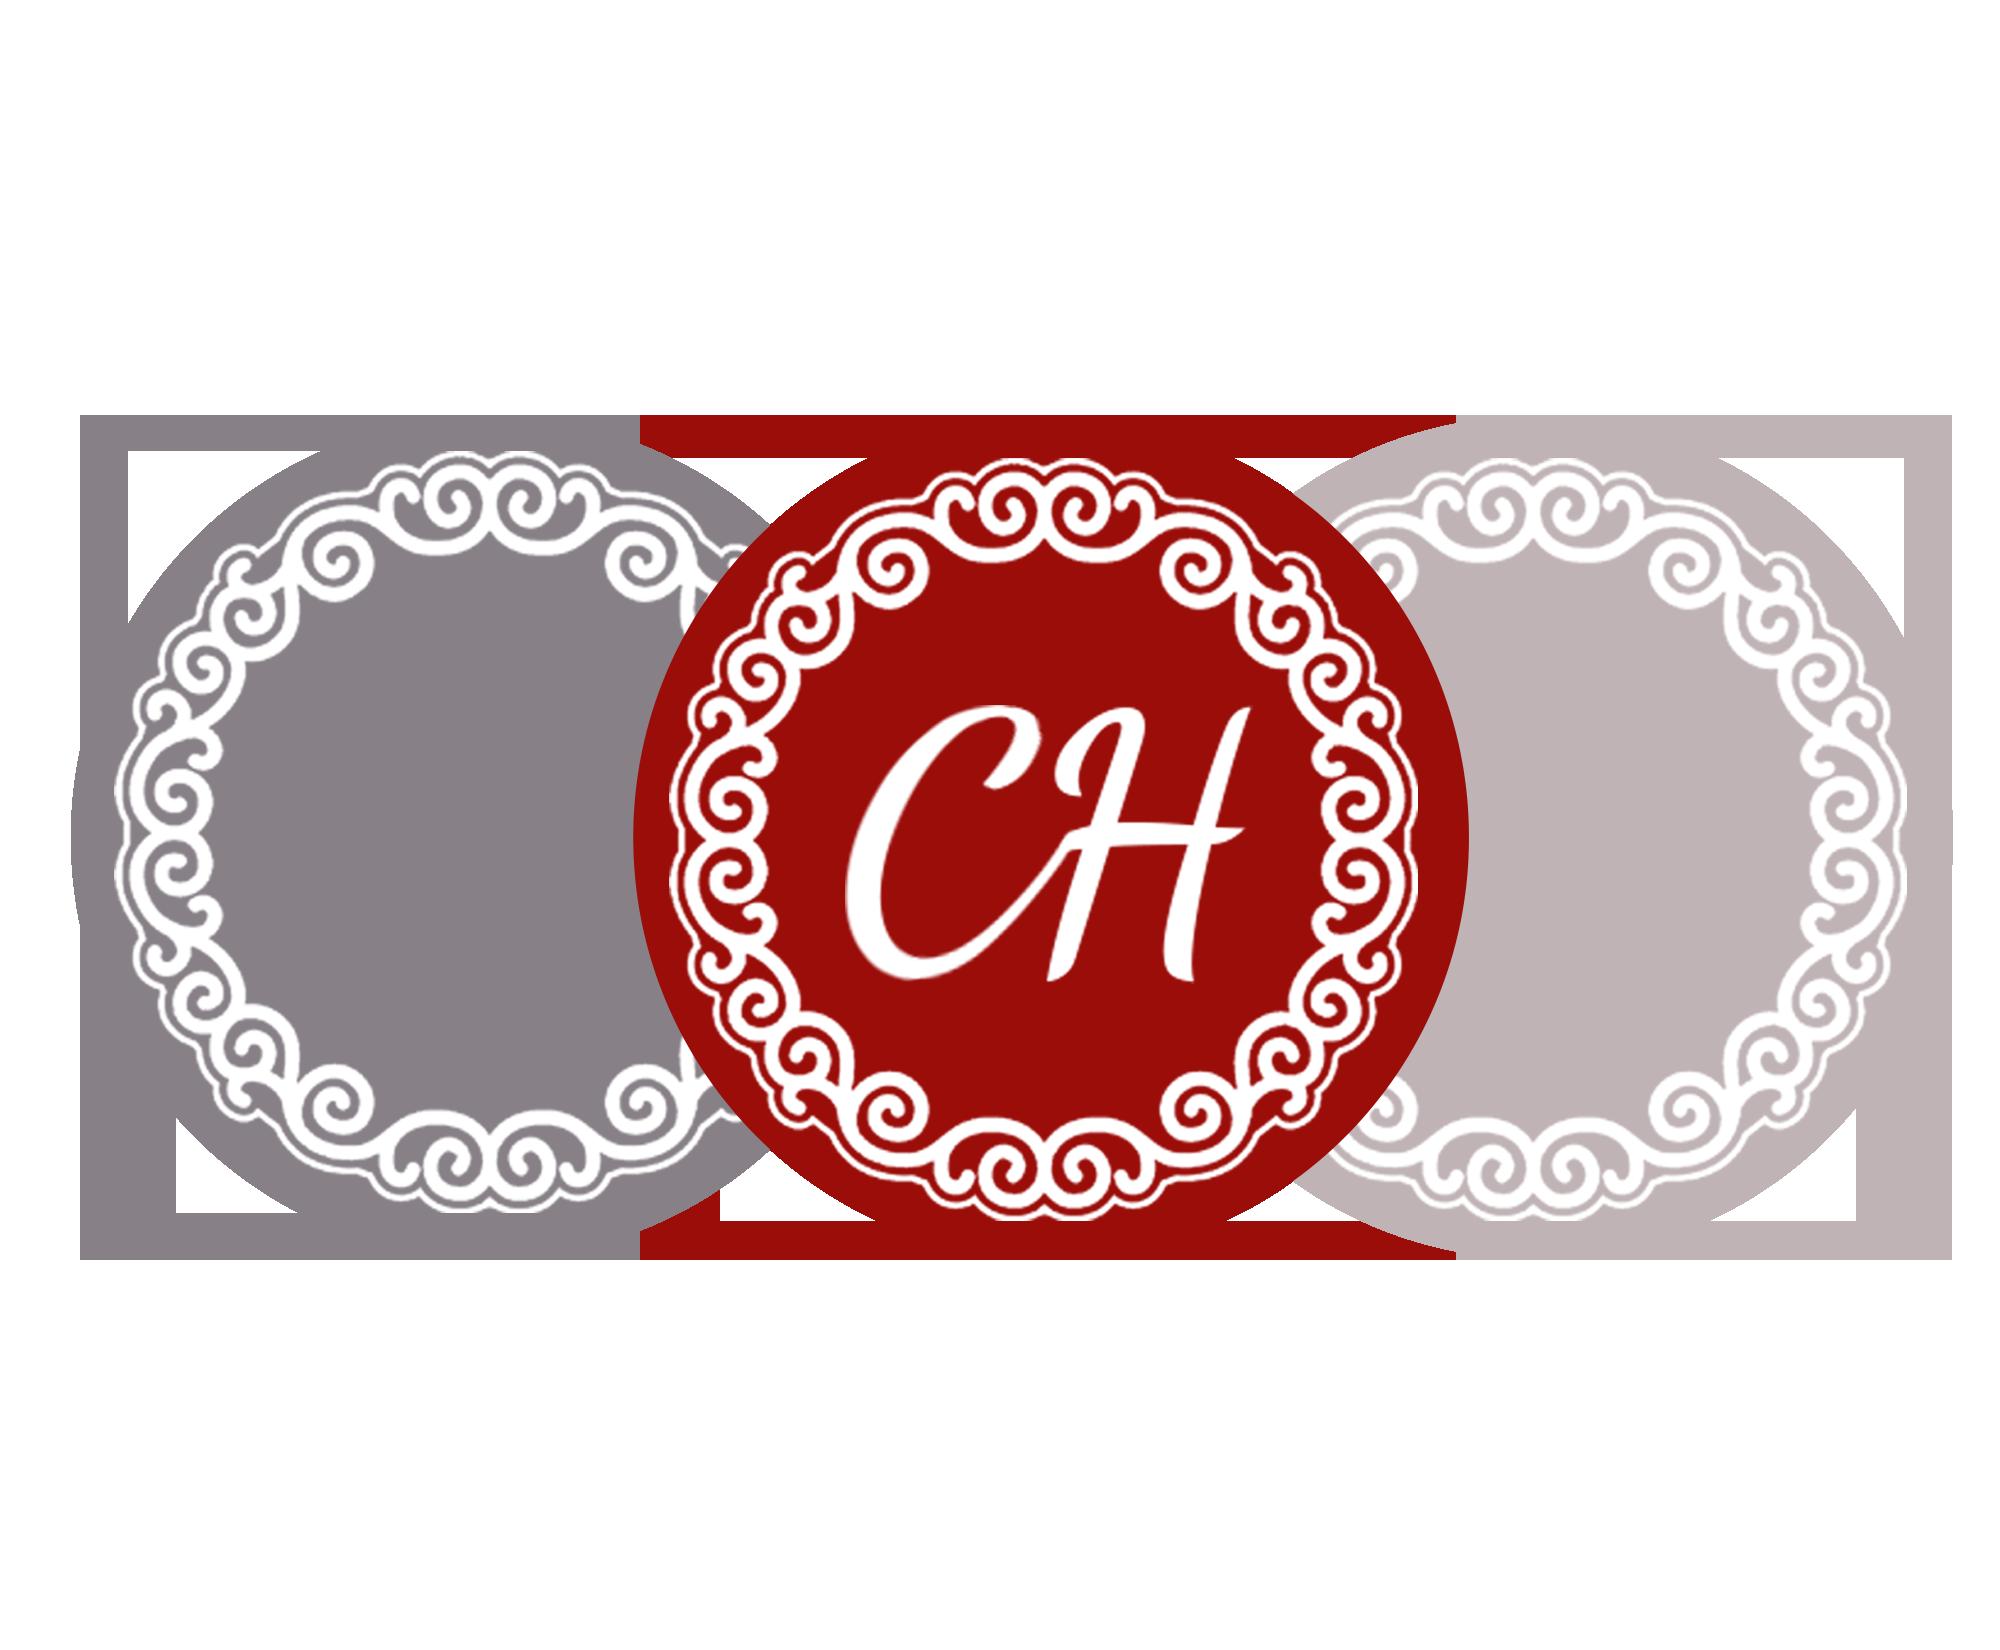 Christine Hull & Associates